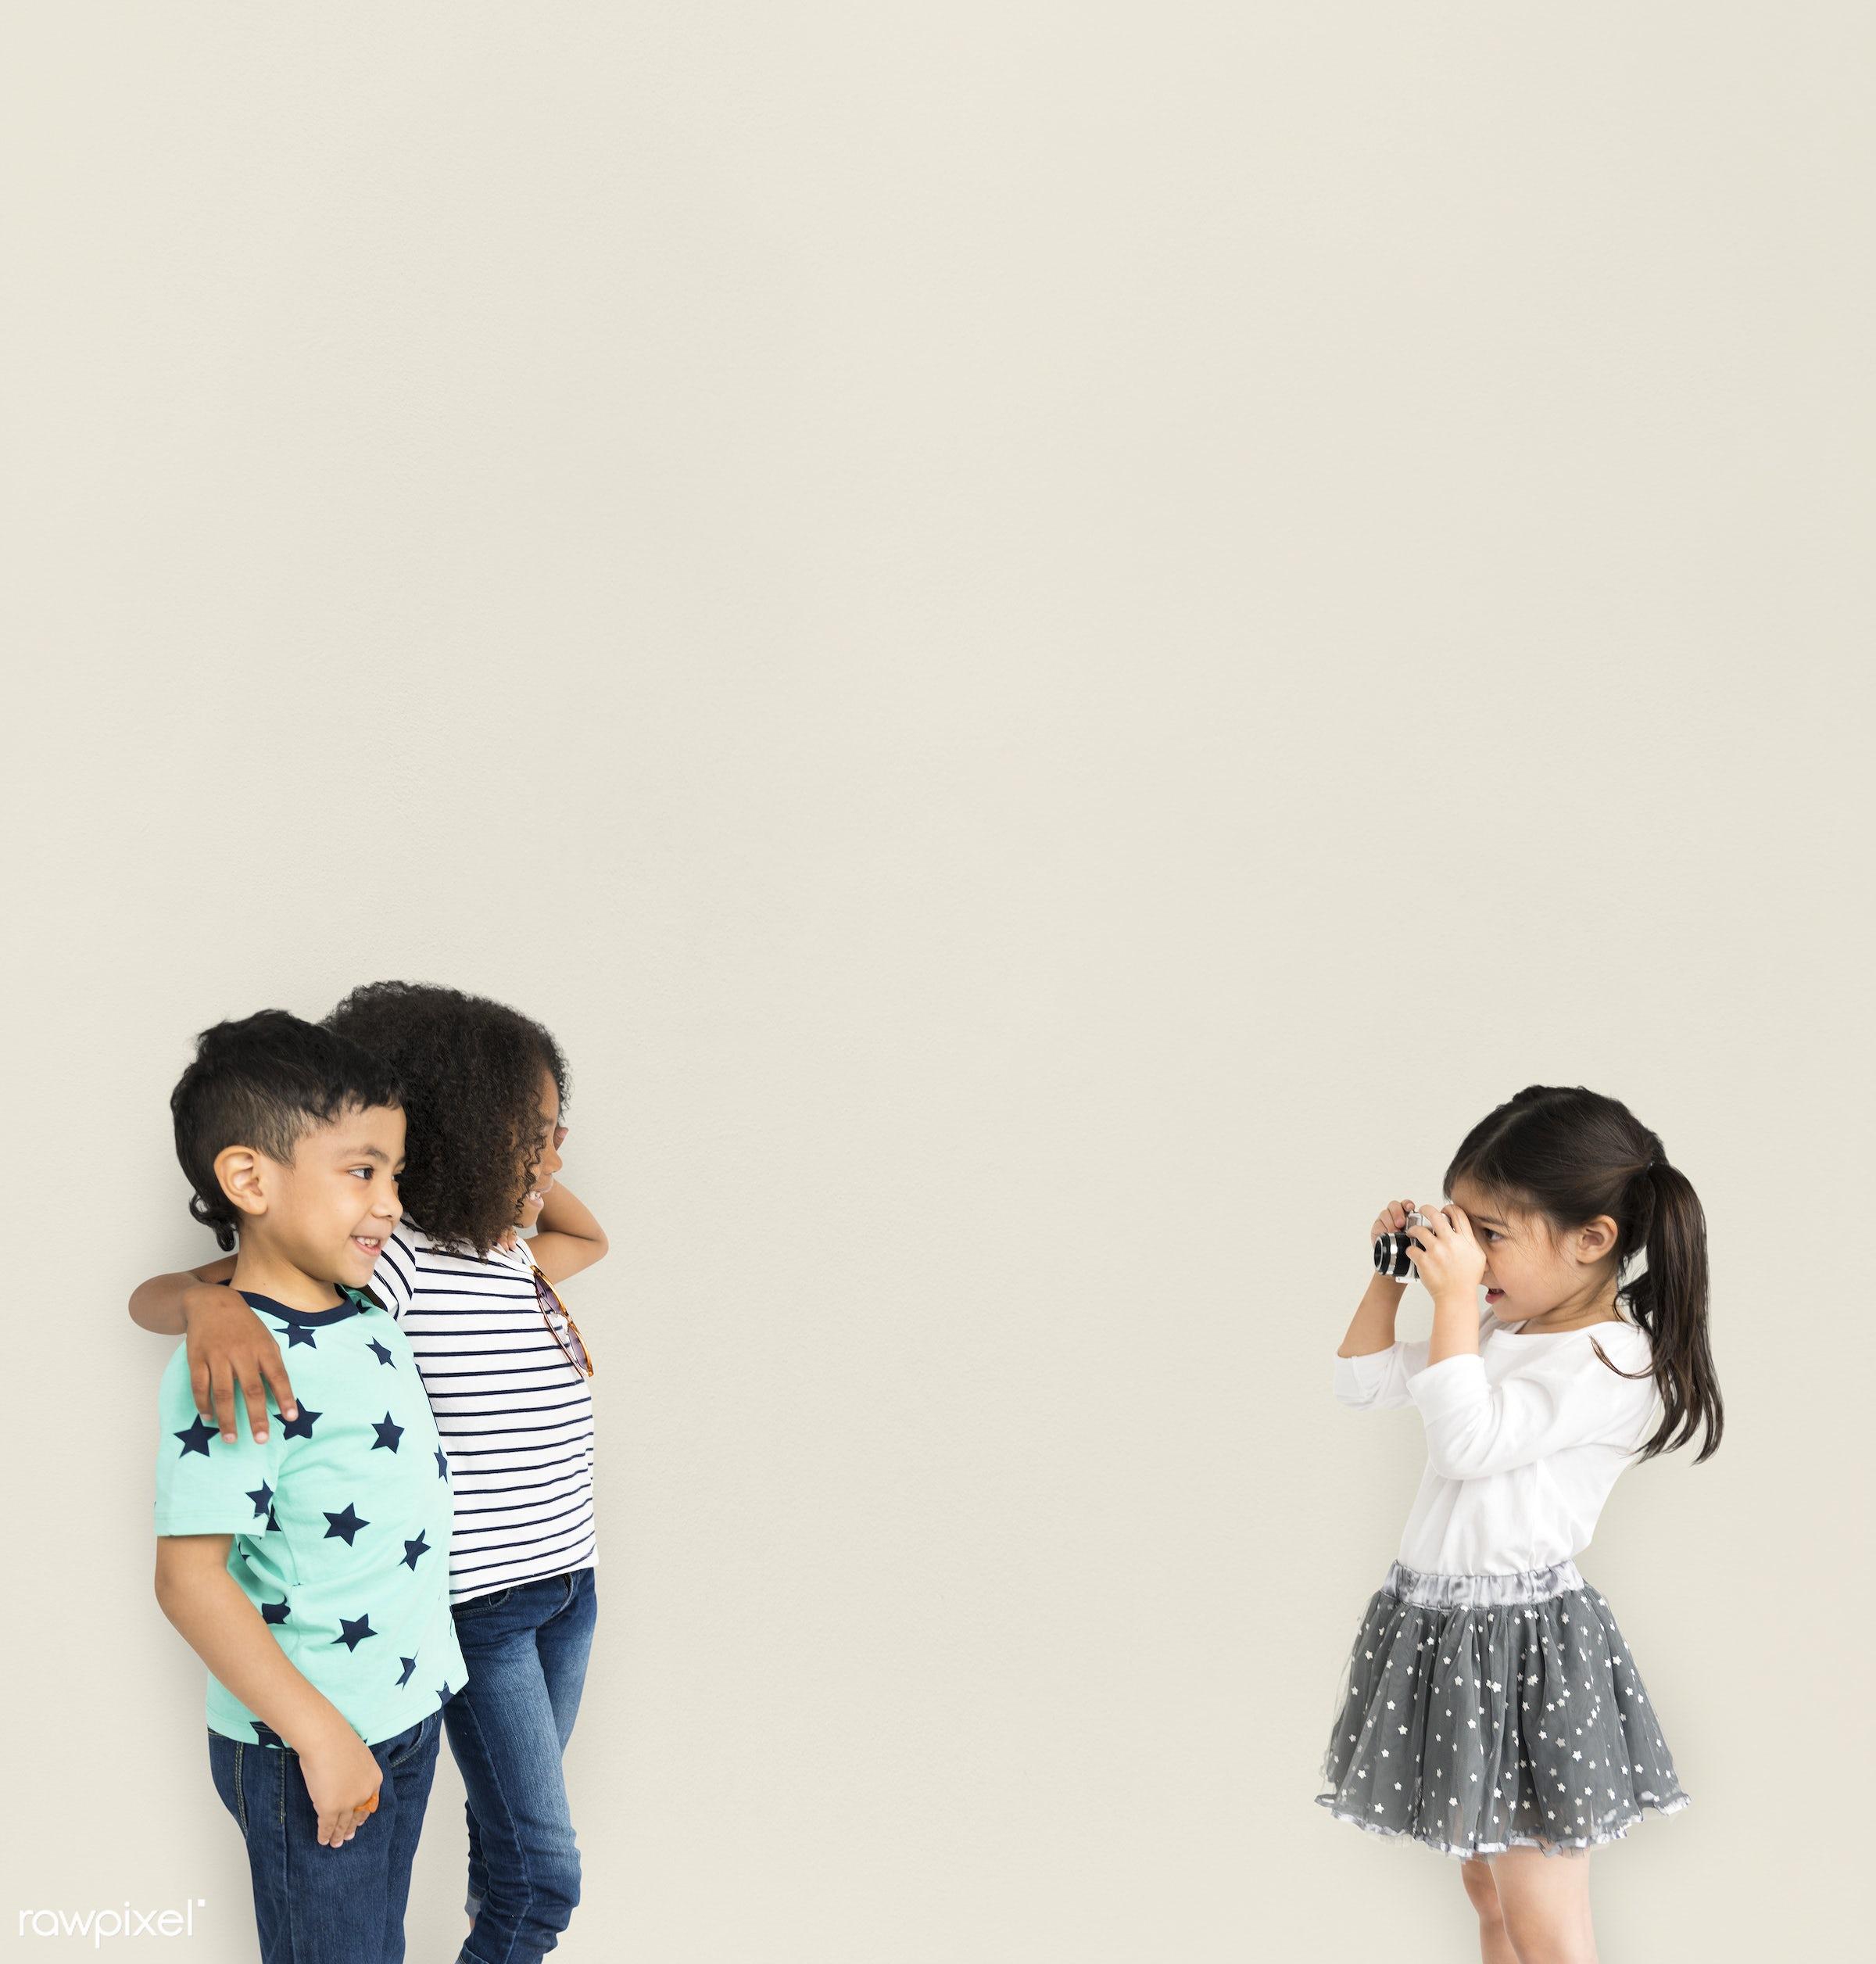 expression, studio, person, diverse, children, little, cute, people, together, positivity, pose, friends, happy, friendship...